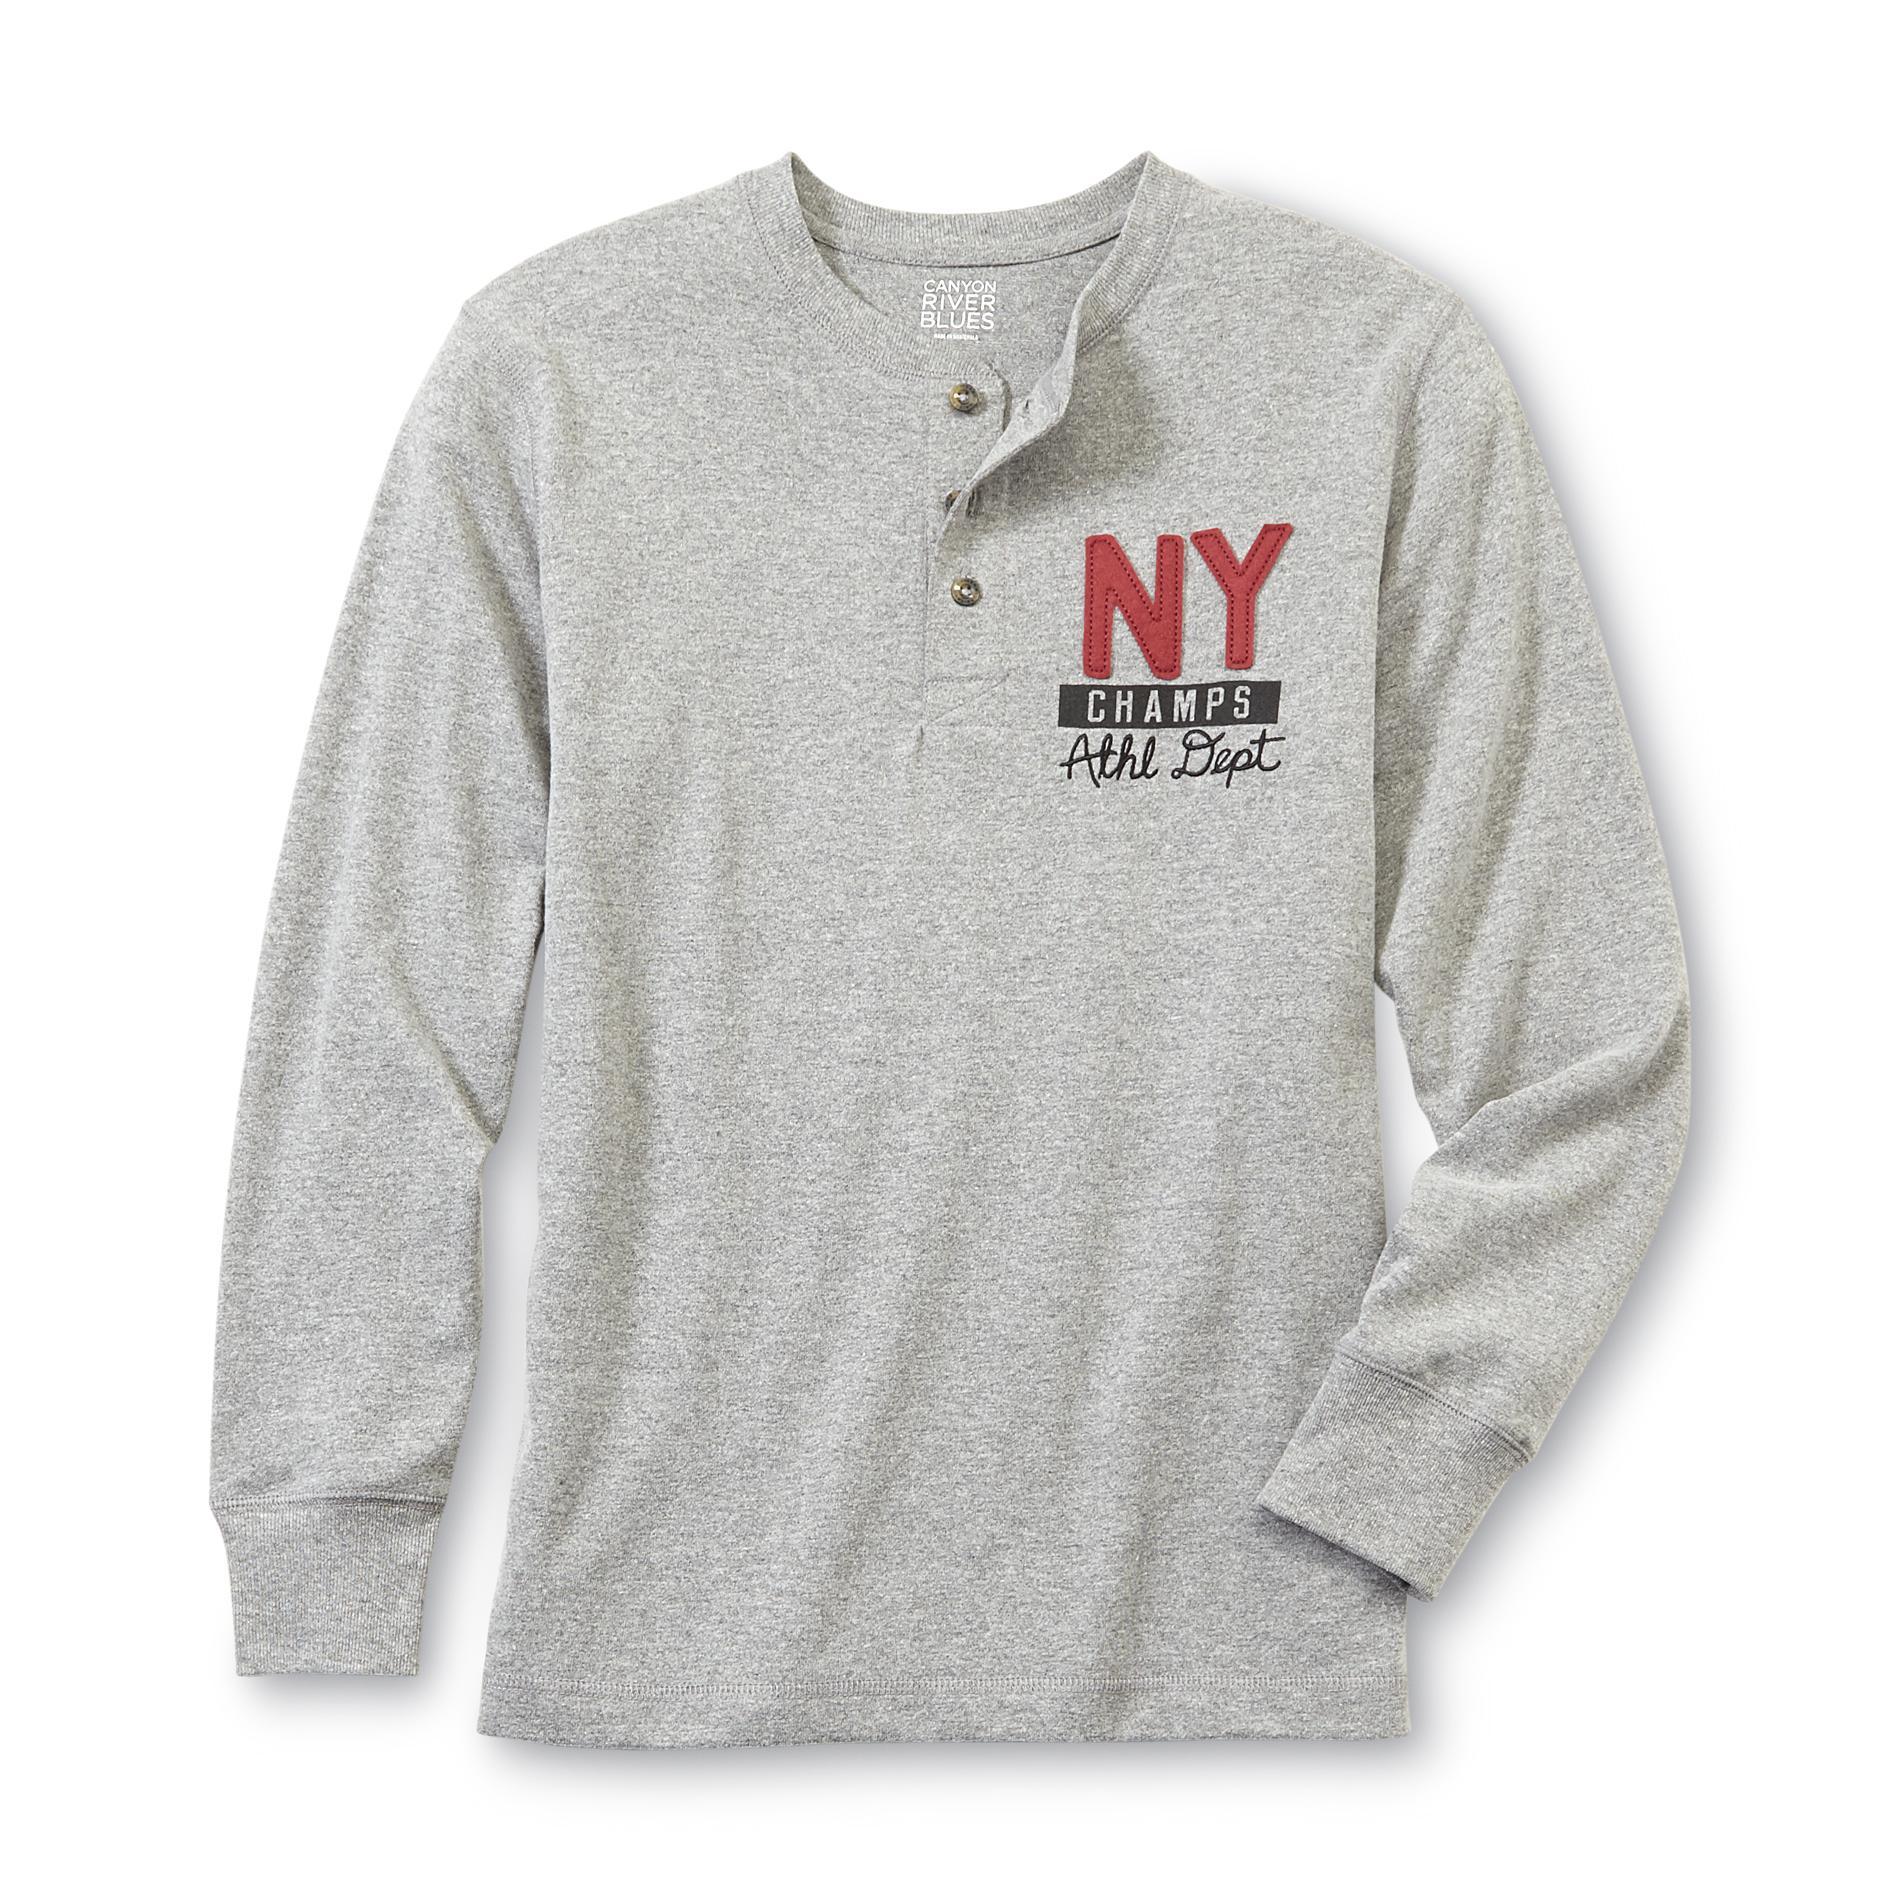 Canyon River Blues Boy's Henley Shirt - NY Champs